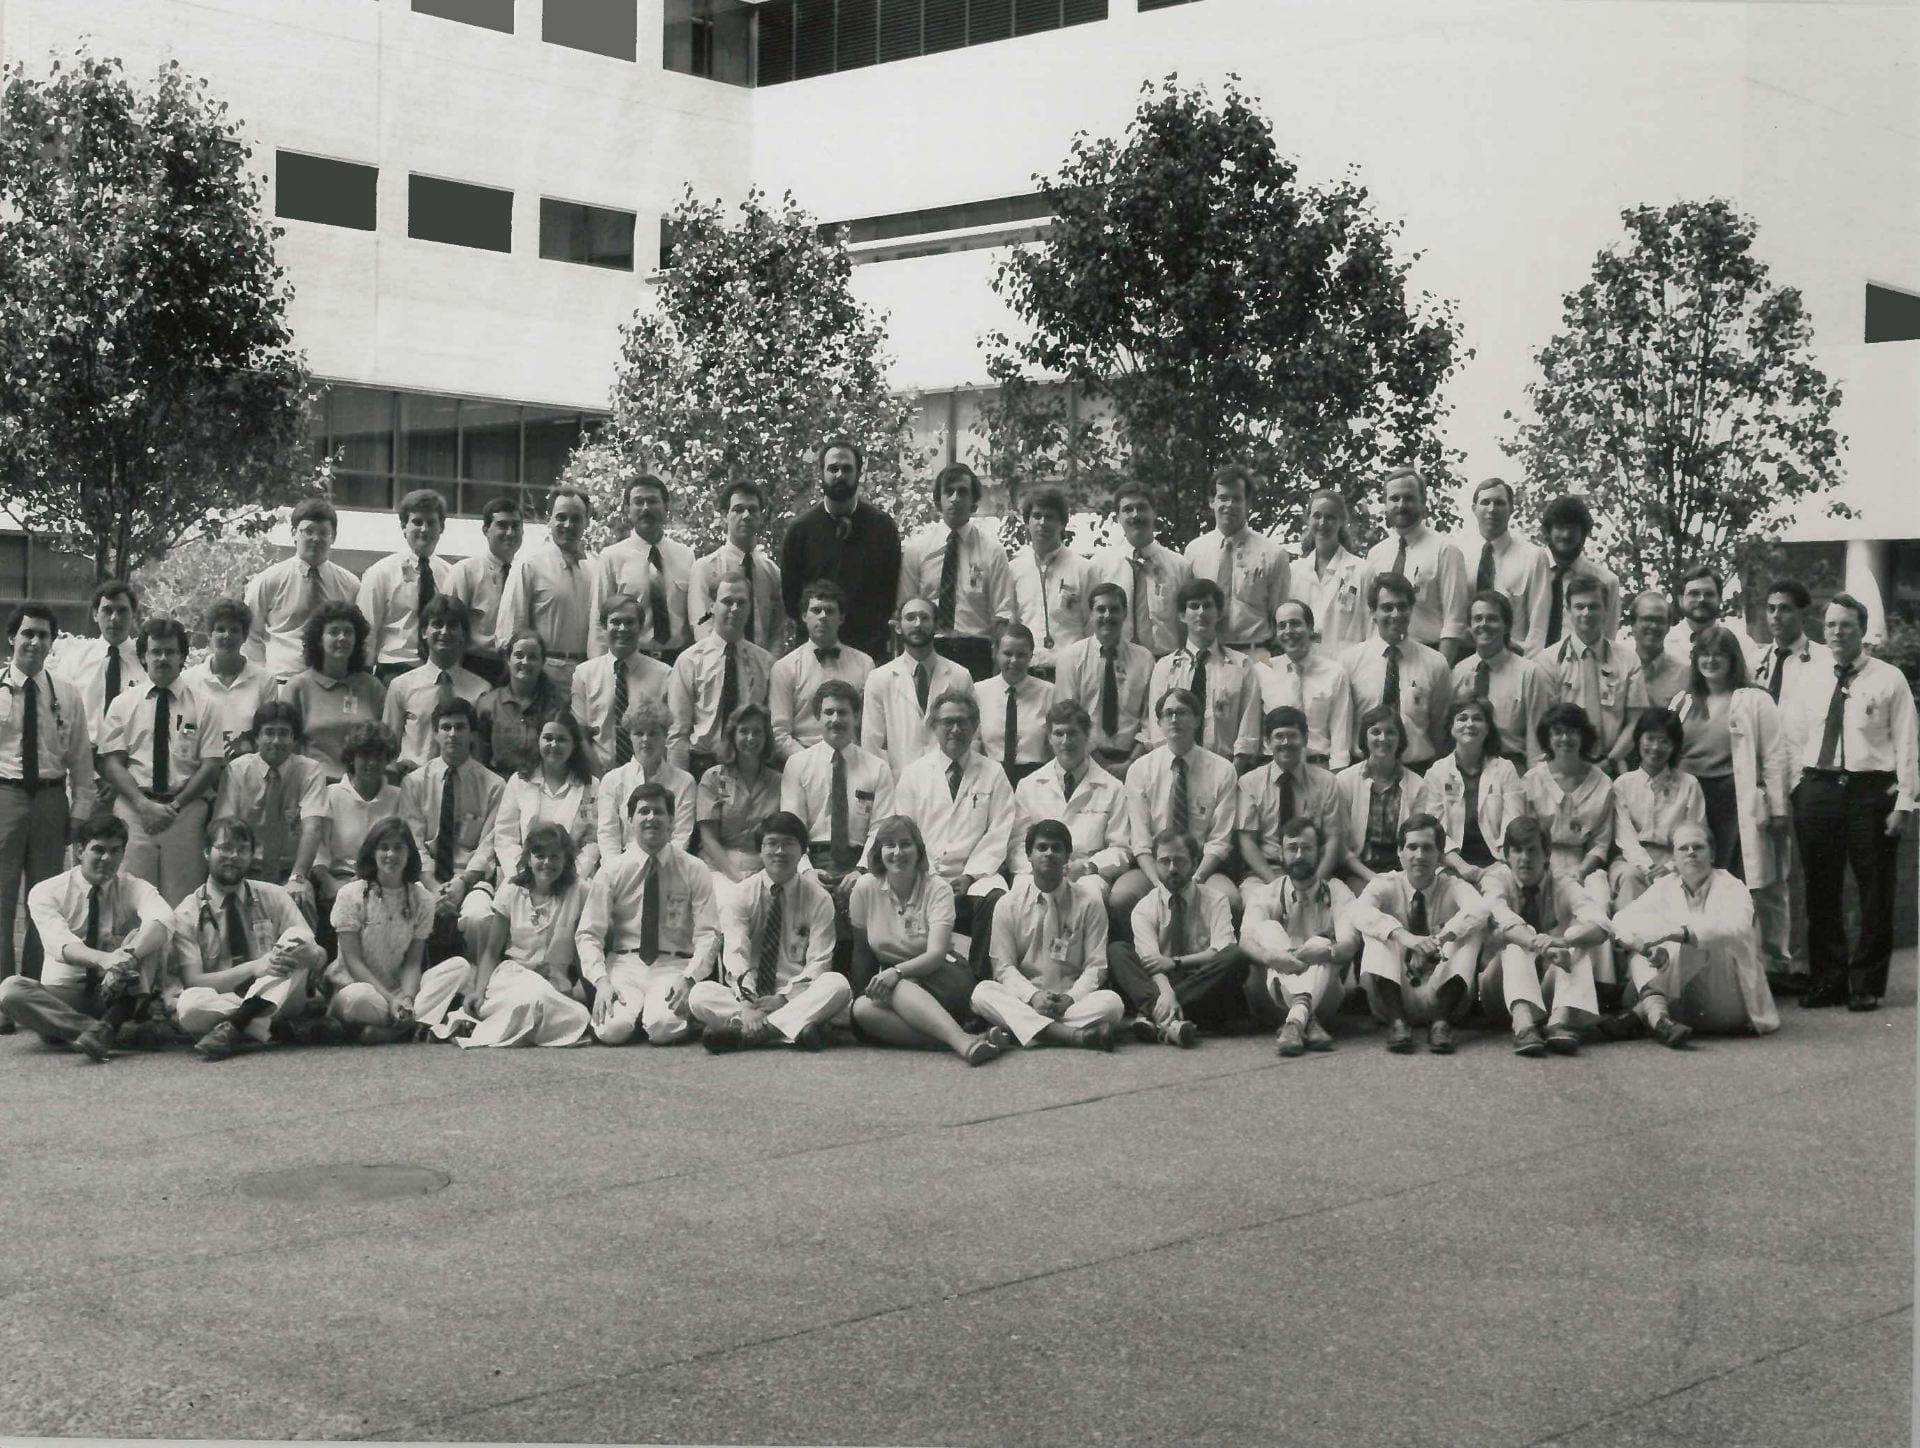 1986 Housestaff Photo